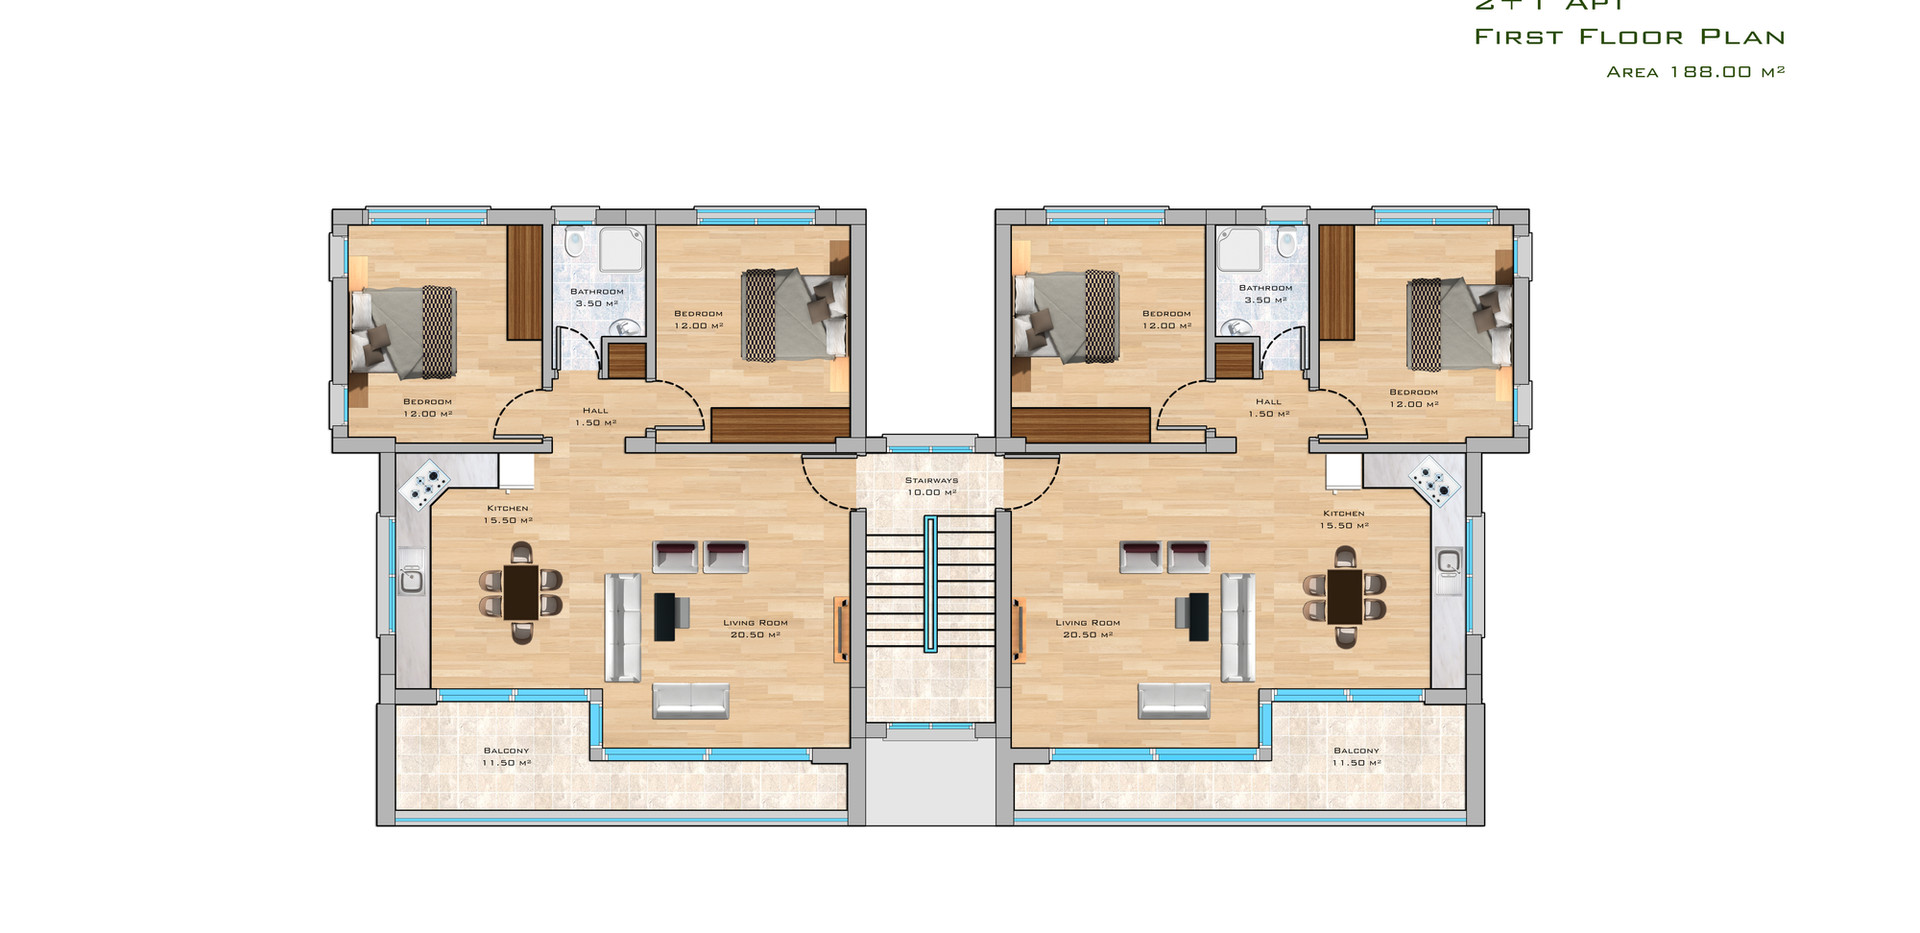 2+1 Apt  first floor plan.jpg